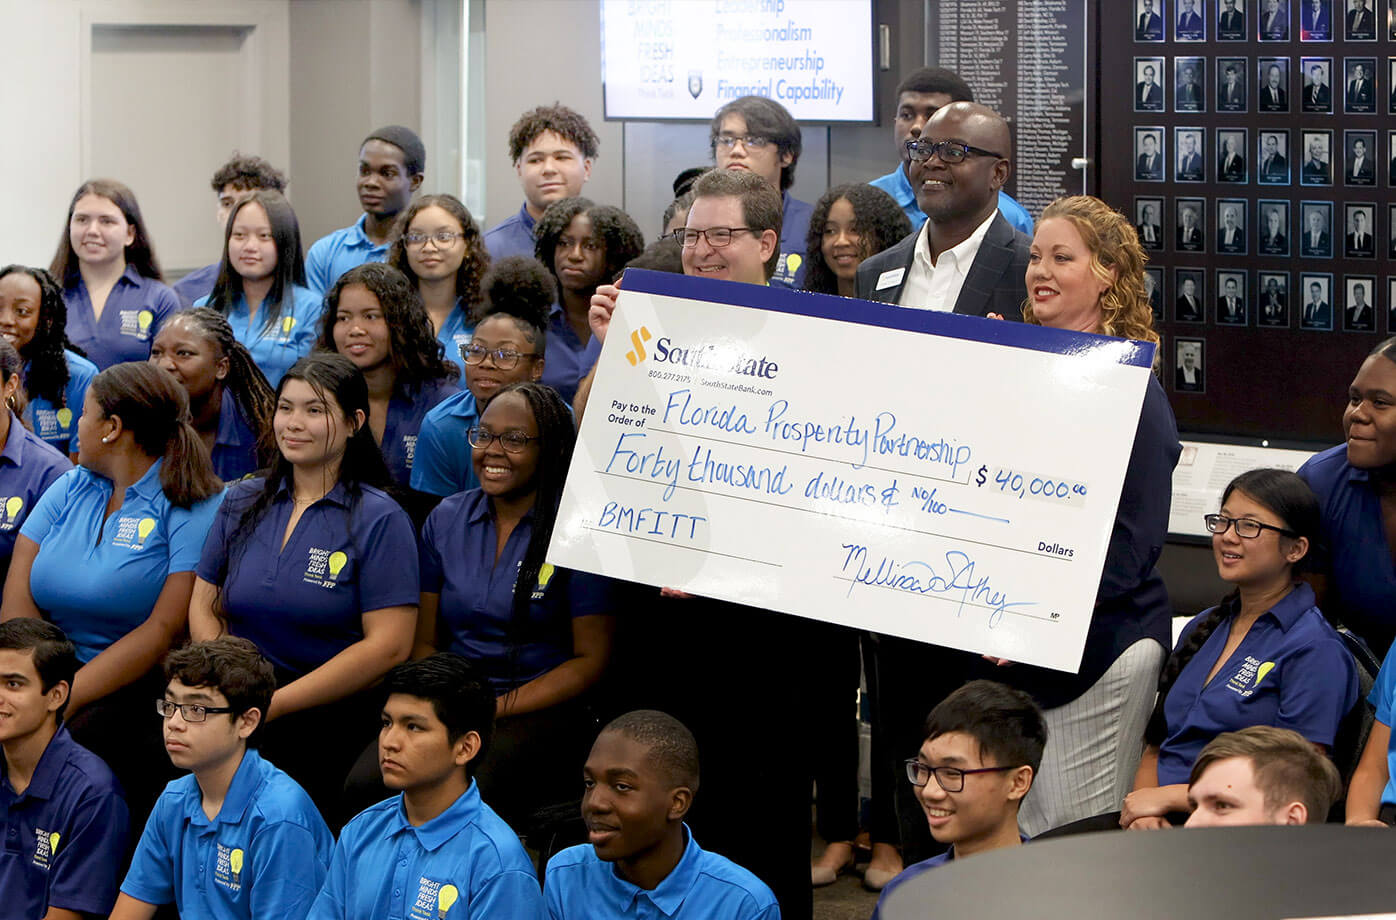 SouthState Bank donation to Florida Prosperity Partnership